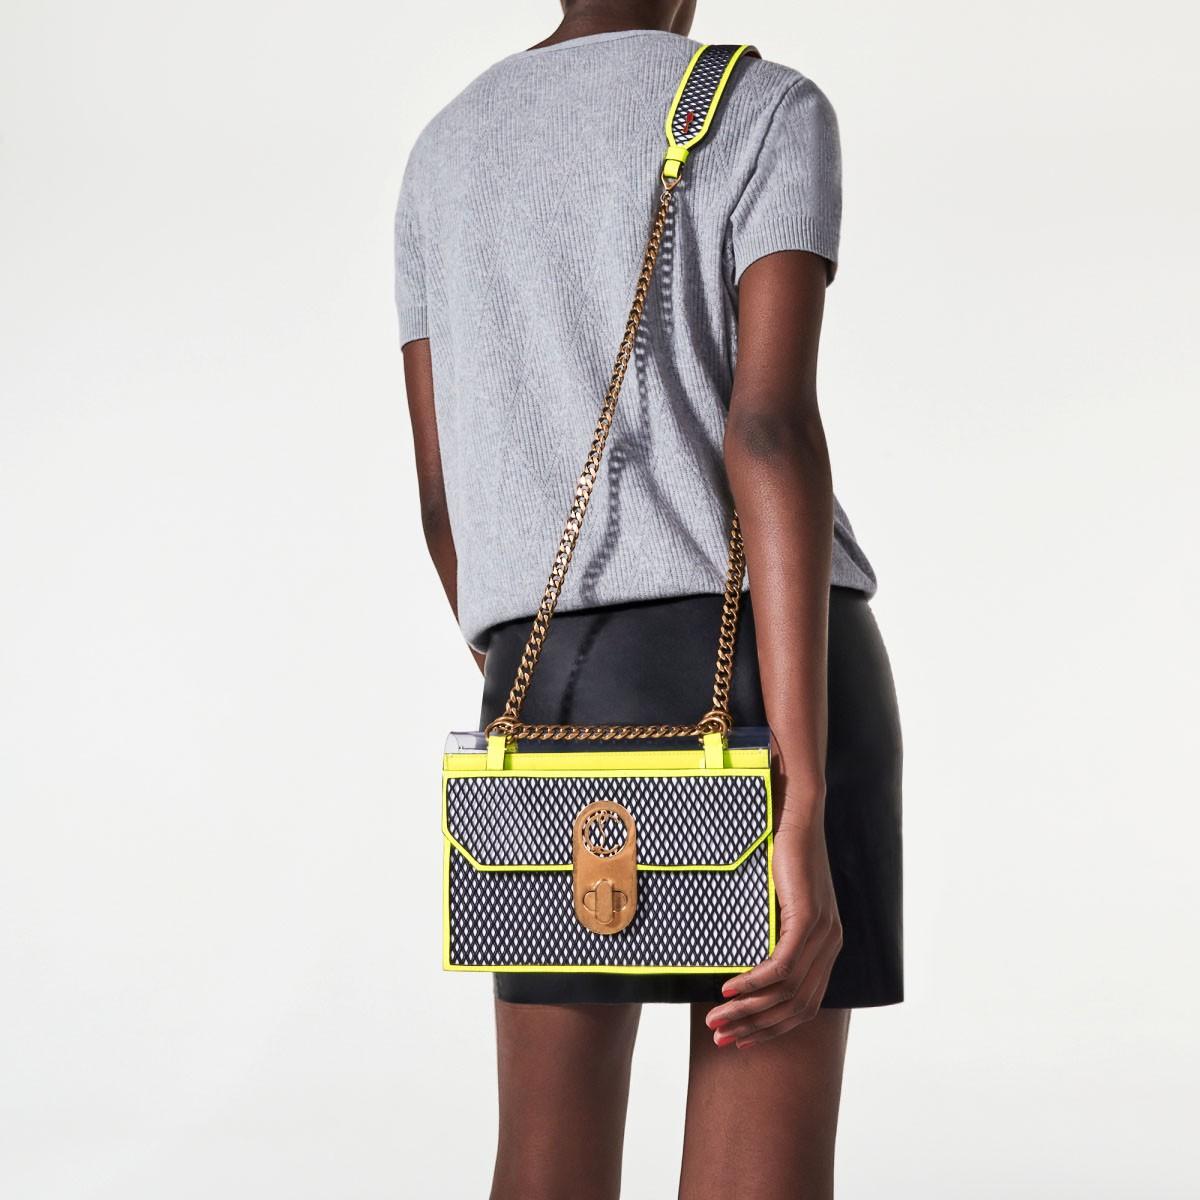 Bags - Elisa Small Creative Fabric - Christian Louboutin